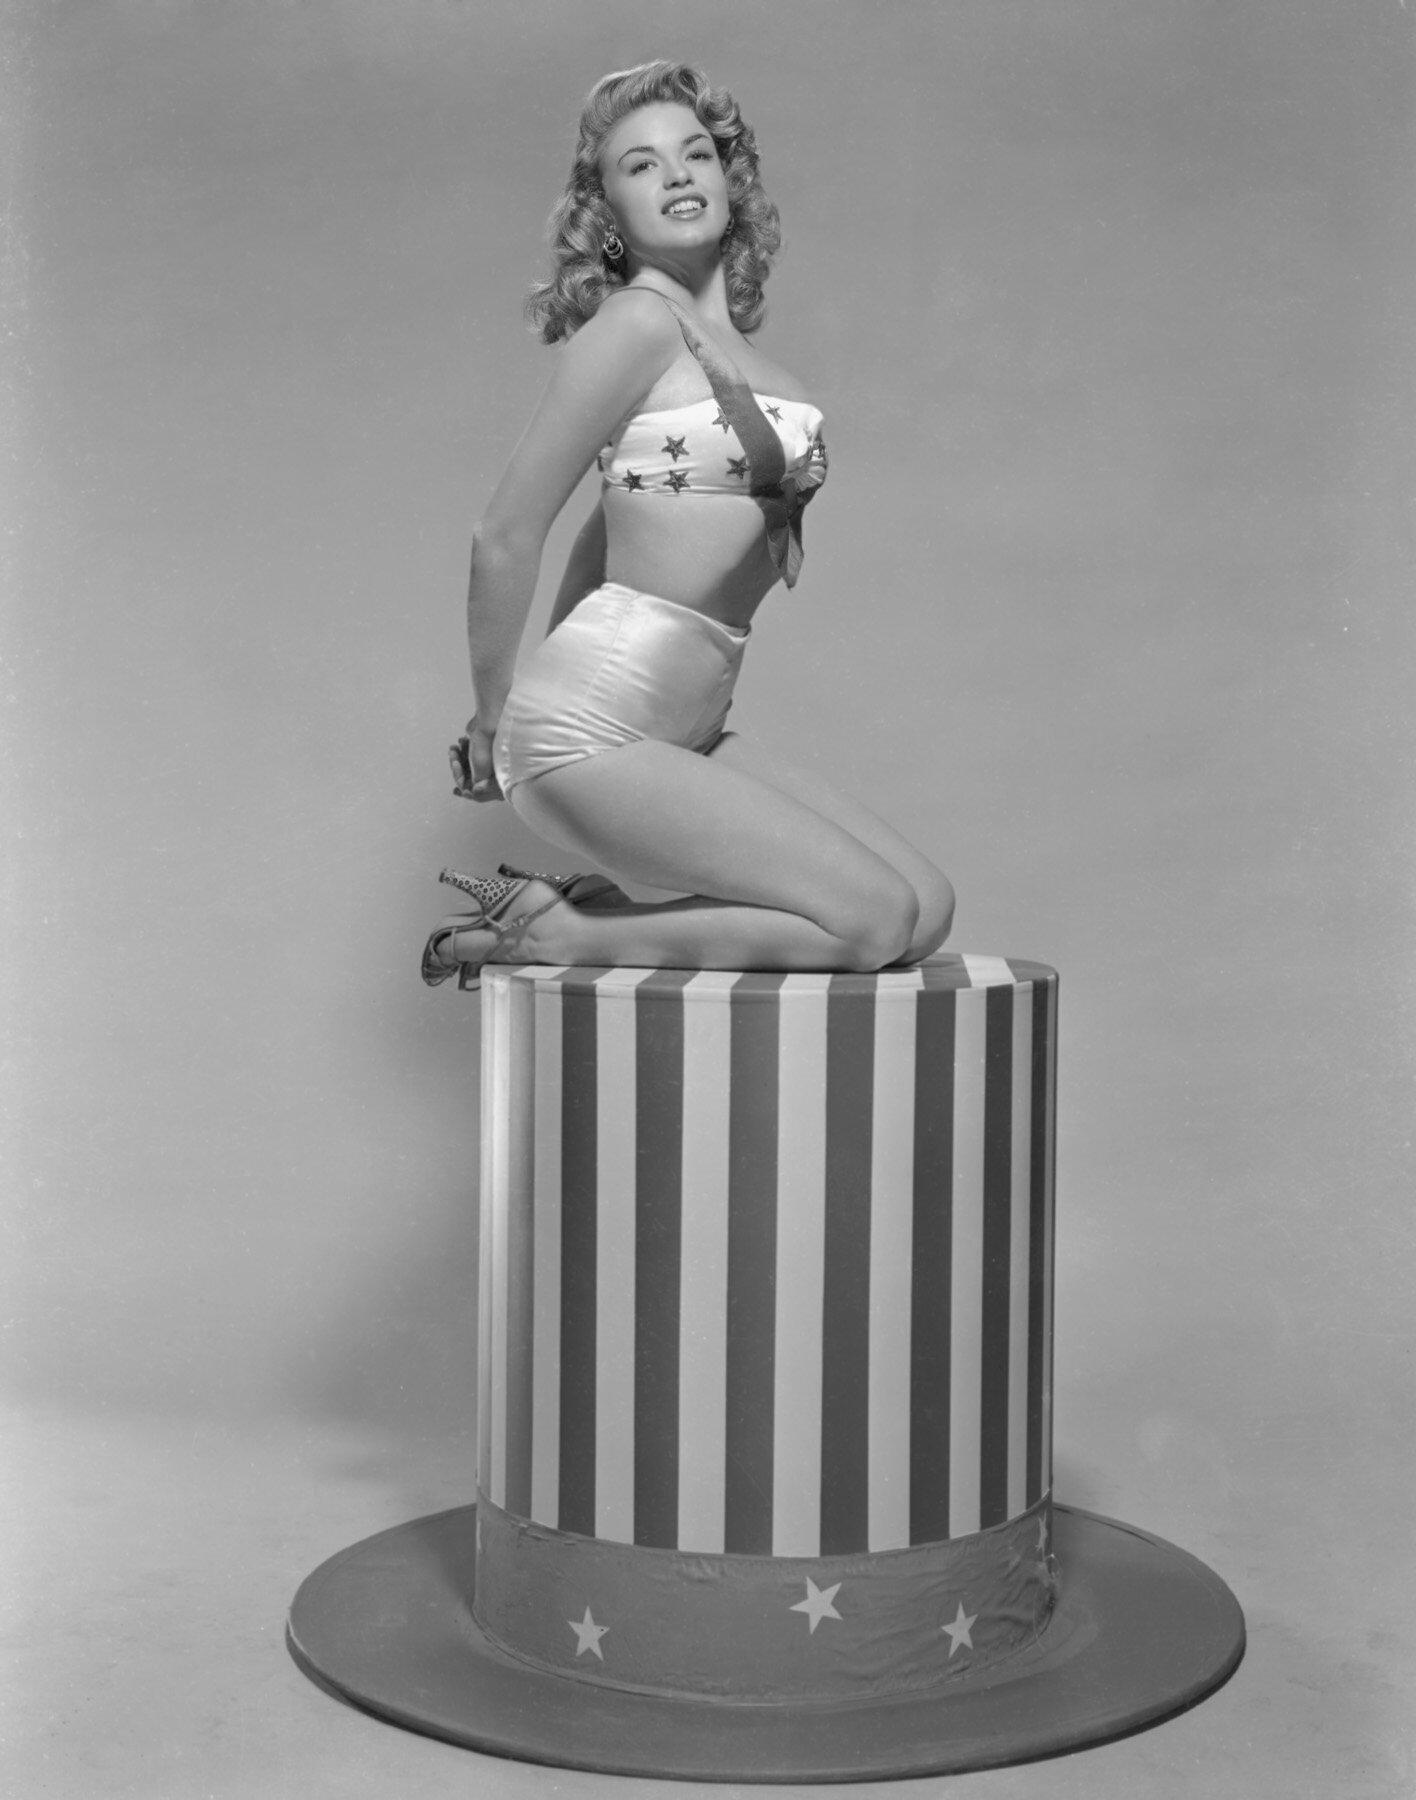 jayne-1953-portrait-studio_publicity-4-4